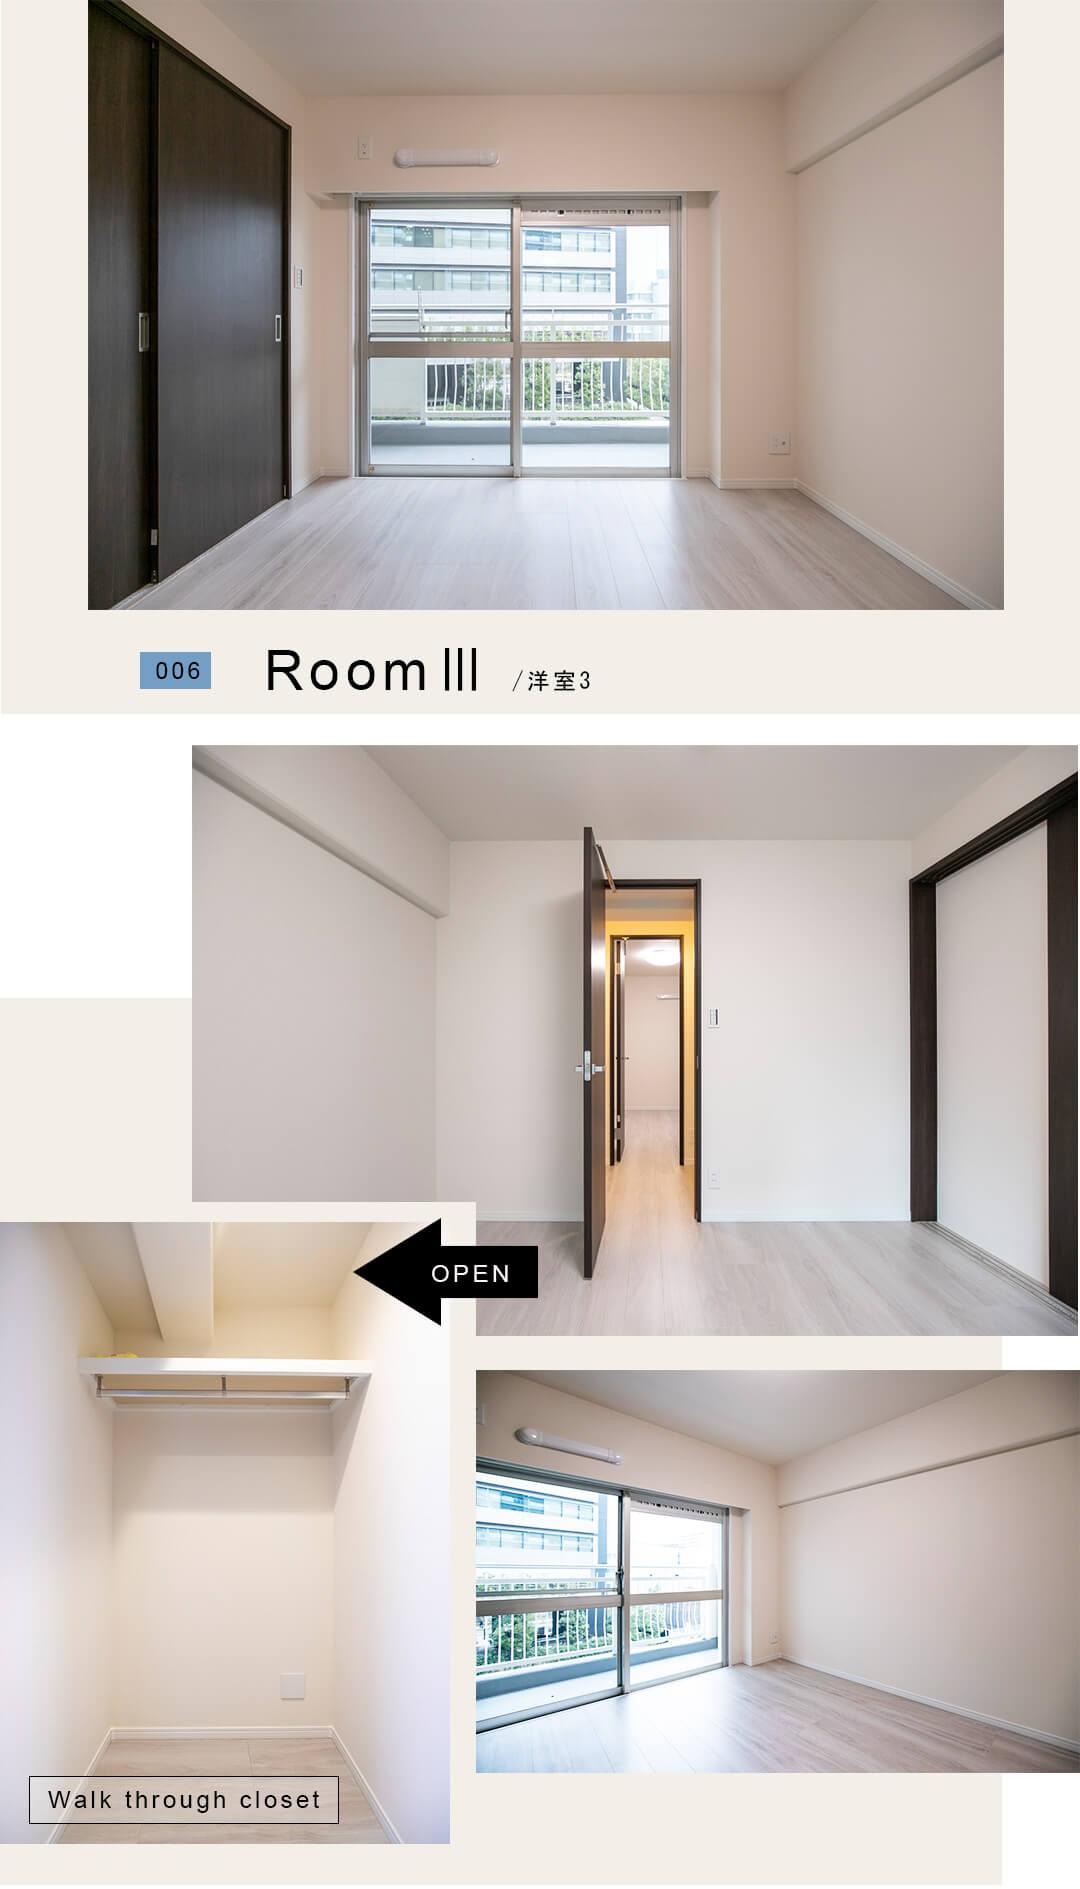 006,RoomI,洋室3